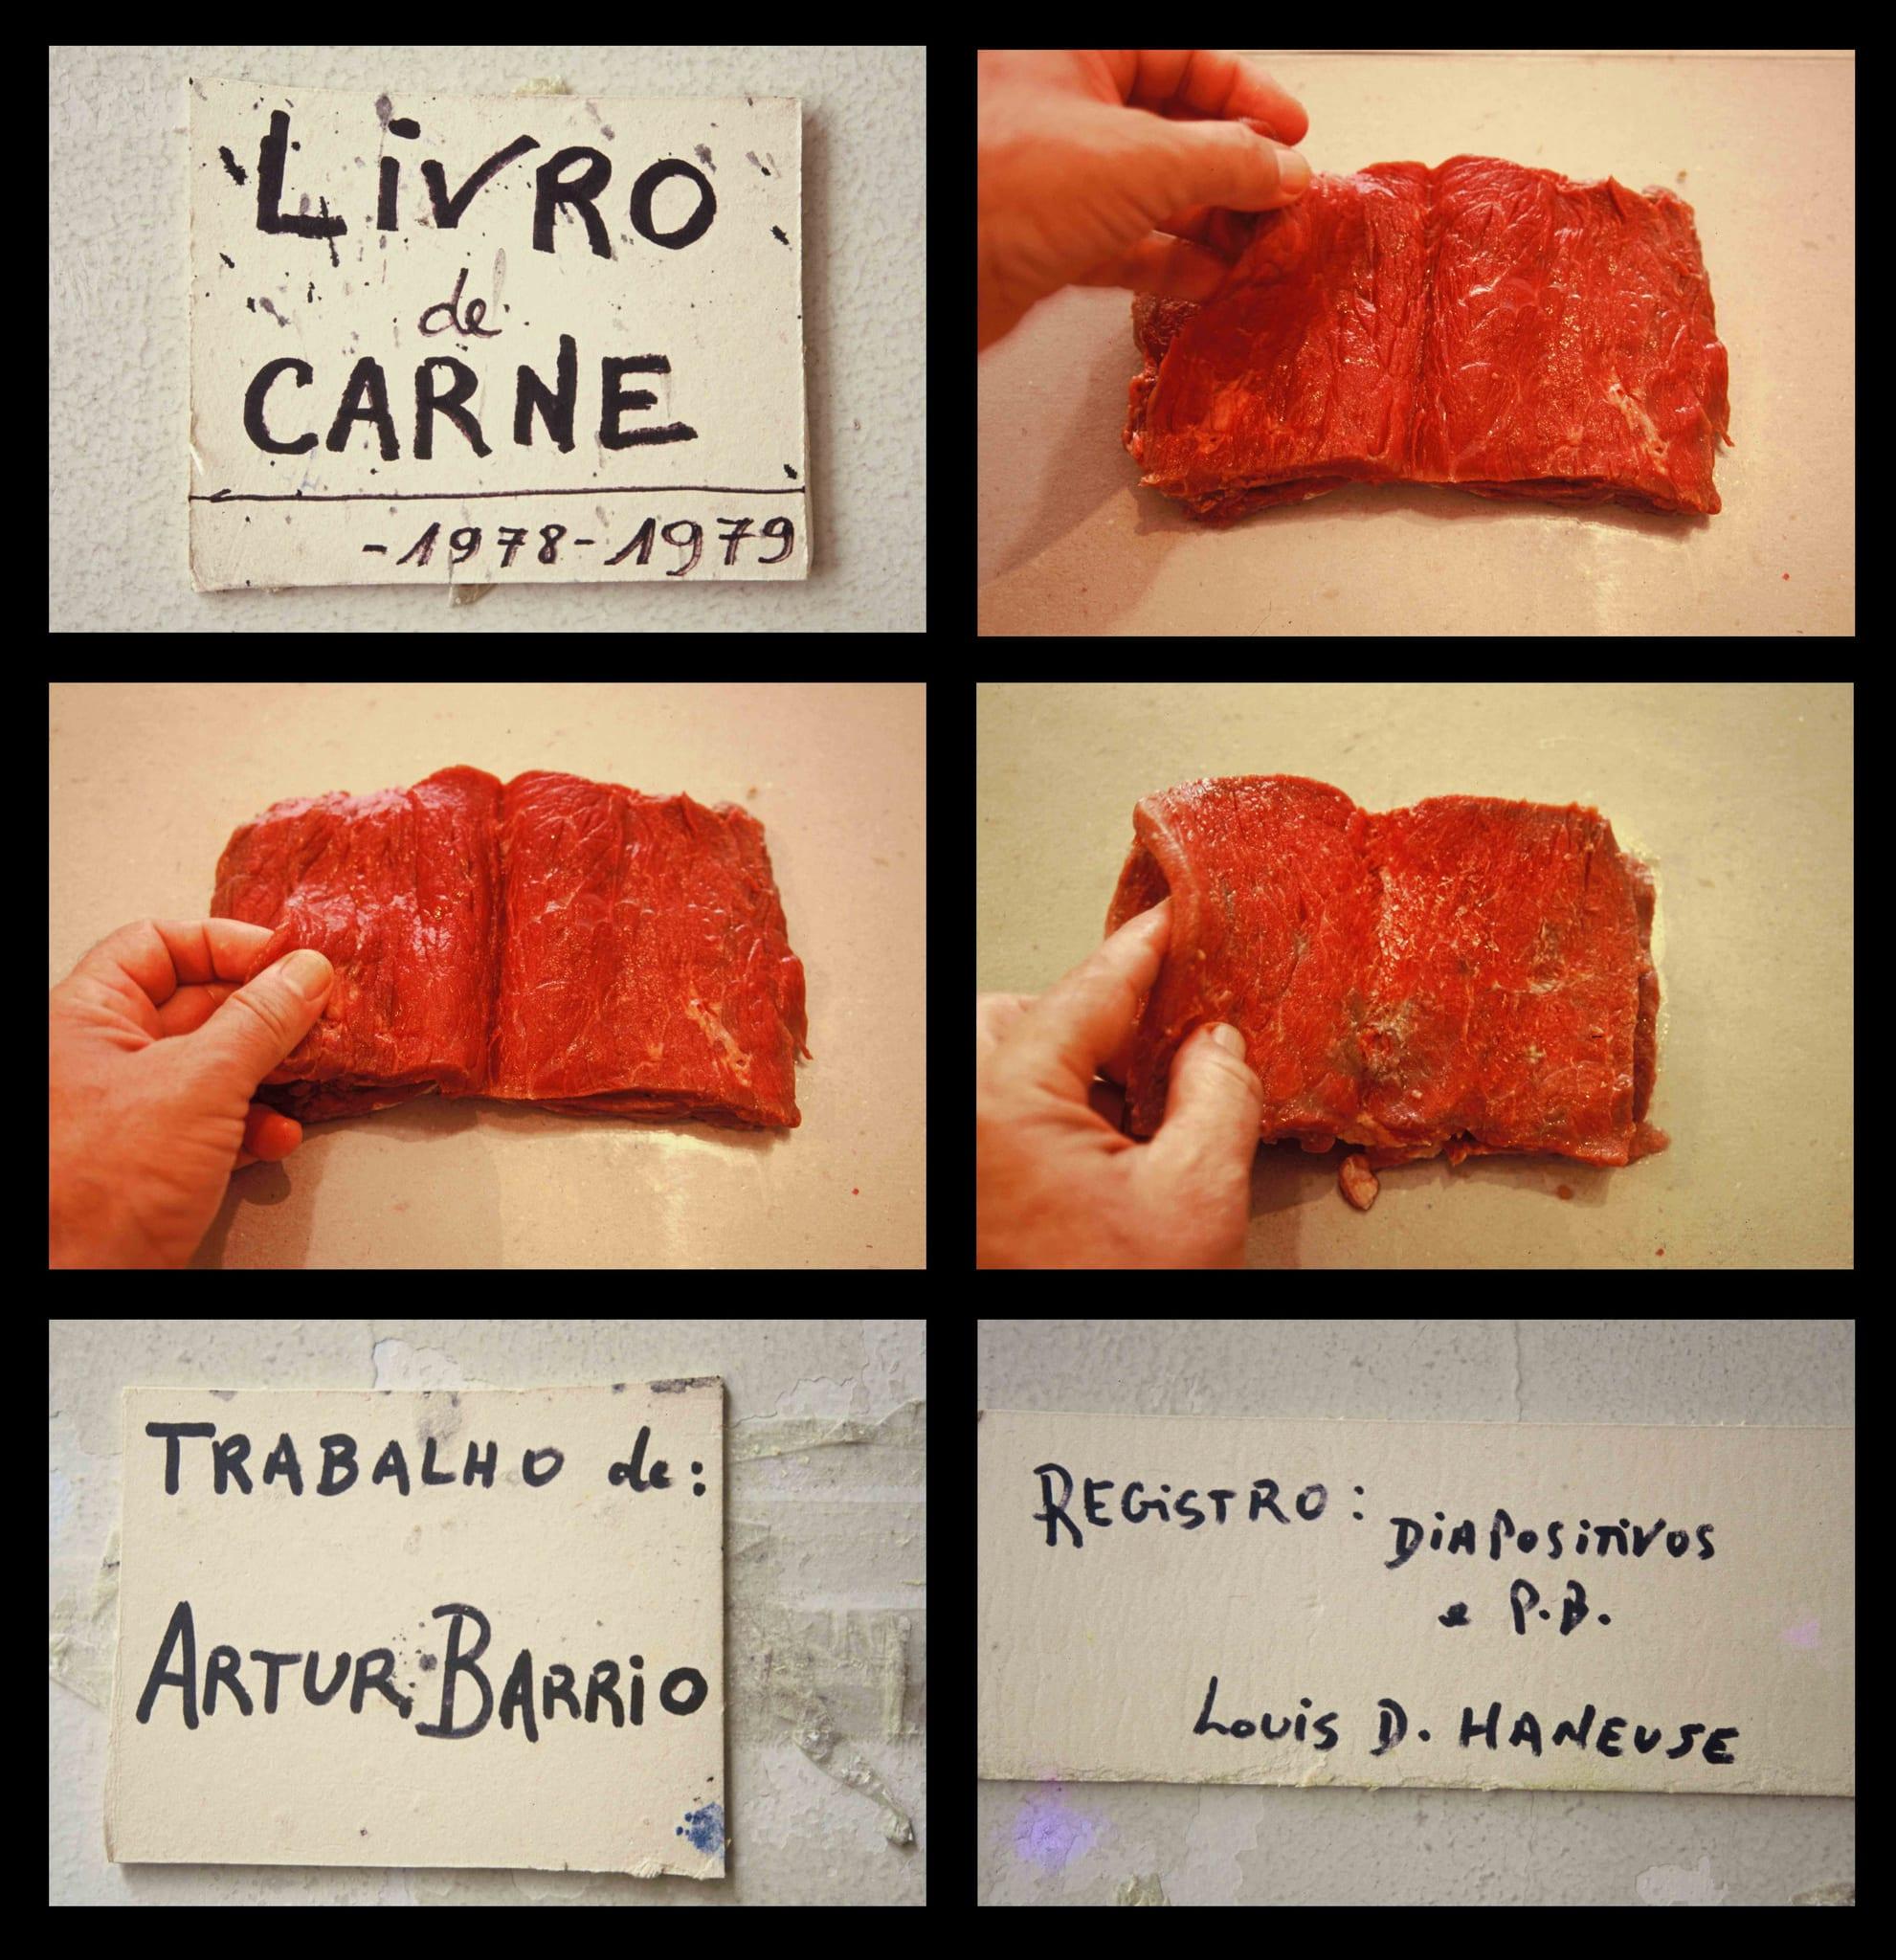 Livro de Carne [Book of Meat] by Artur Barrio